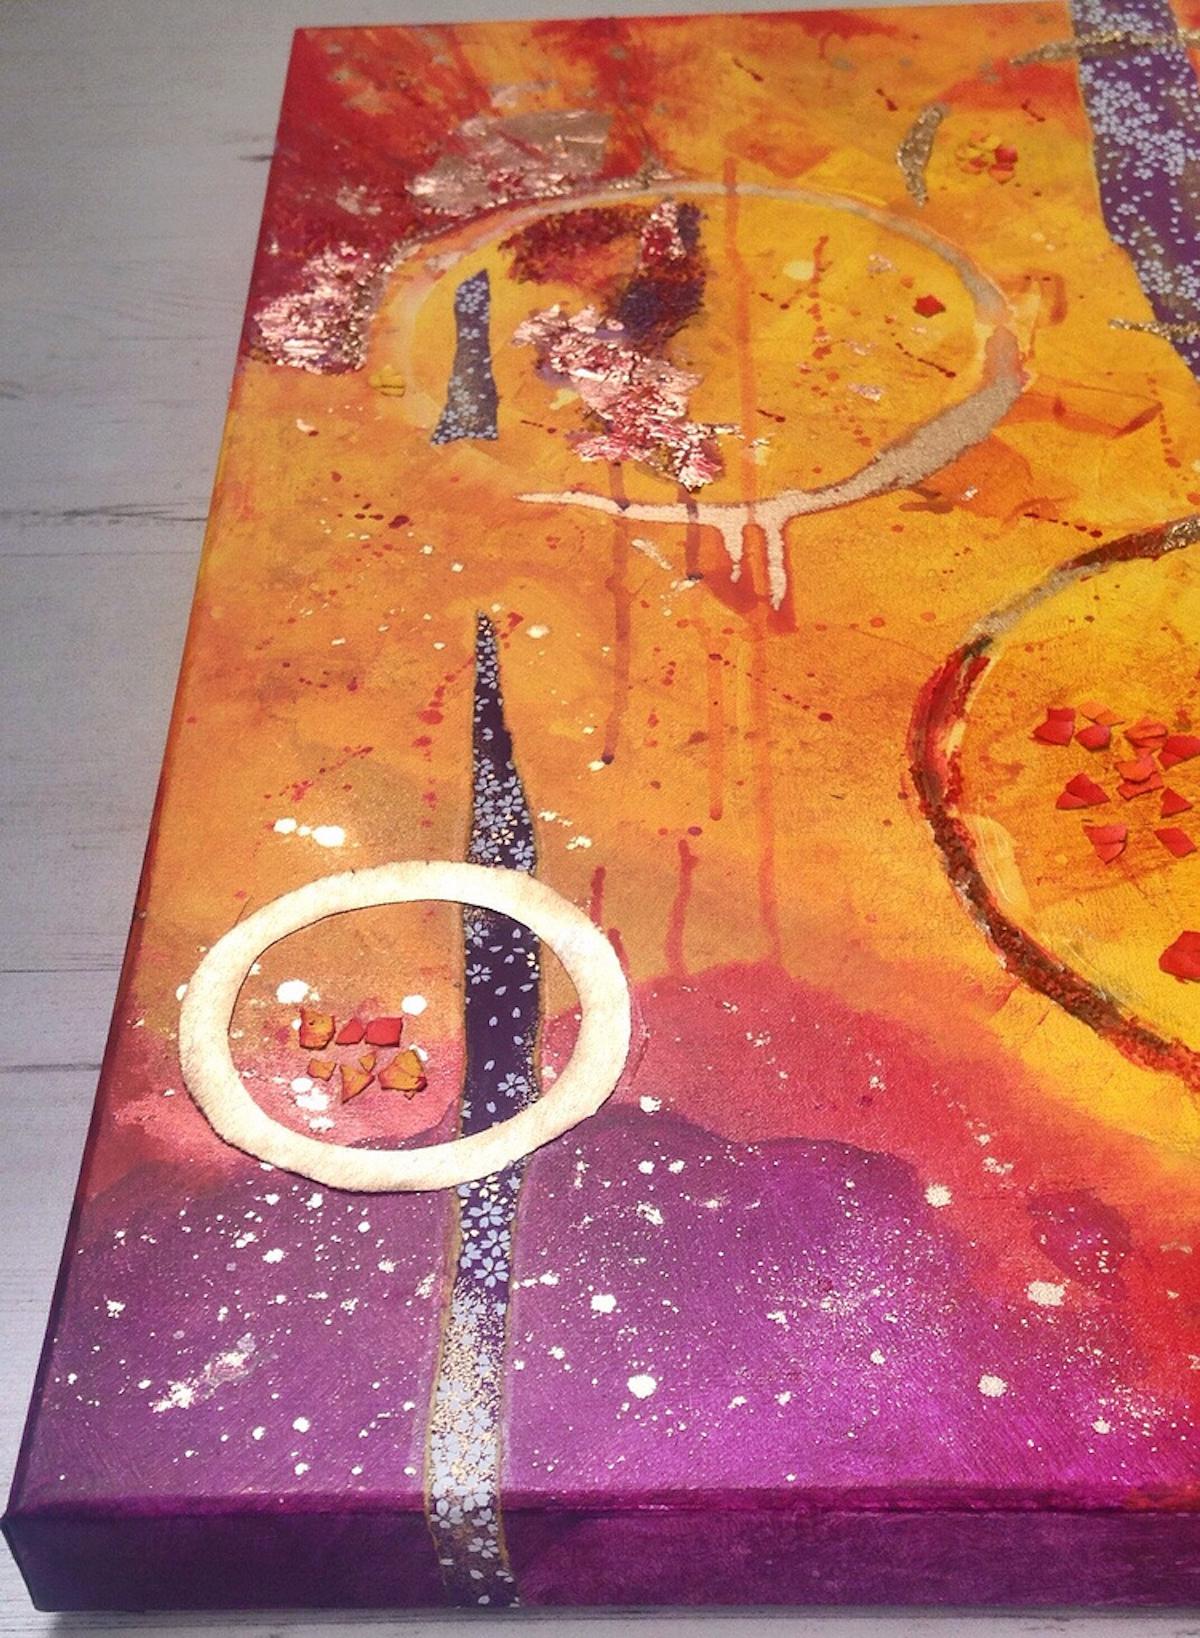 New Abstract Art: Autumn Equinox